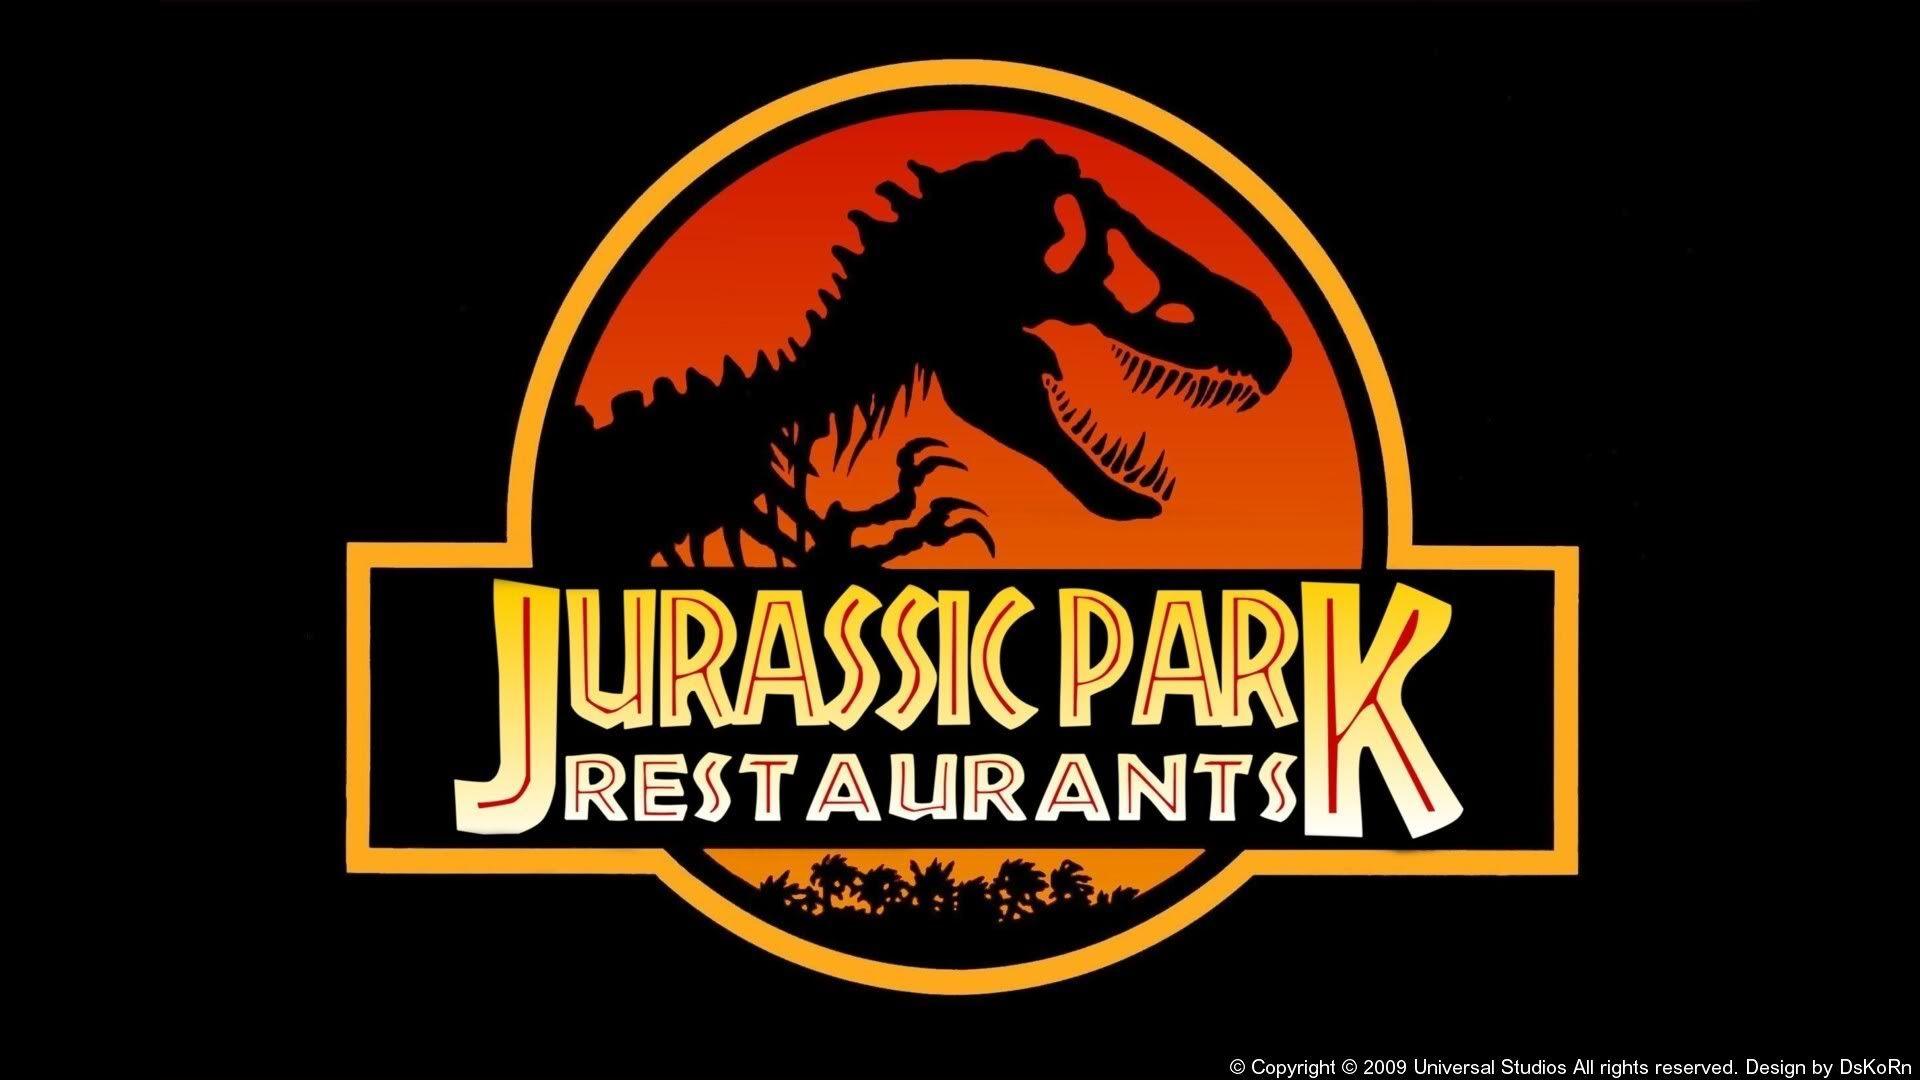 Jurassic Park Movie Poster Hd Wallpaper Download